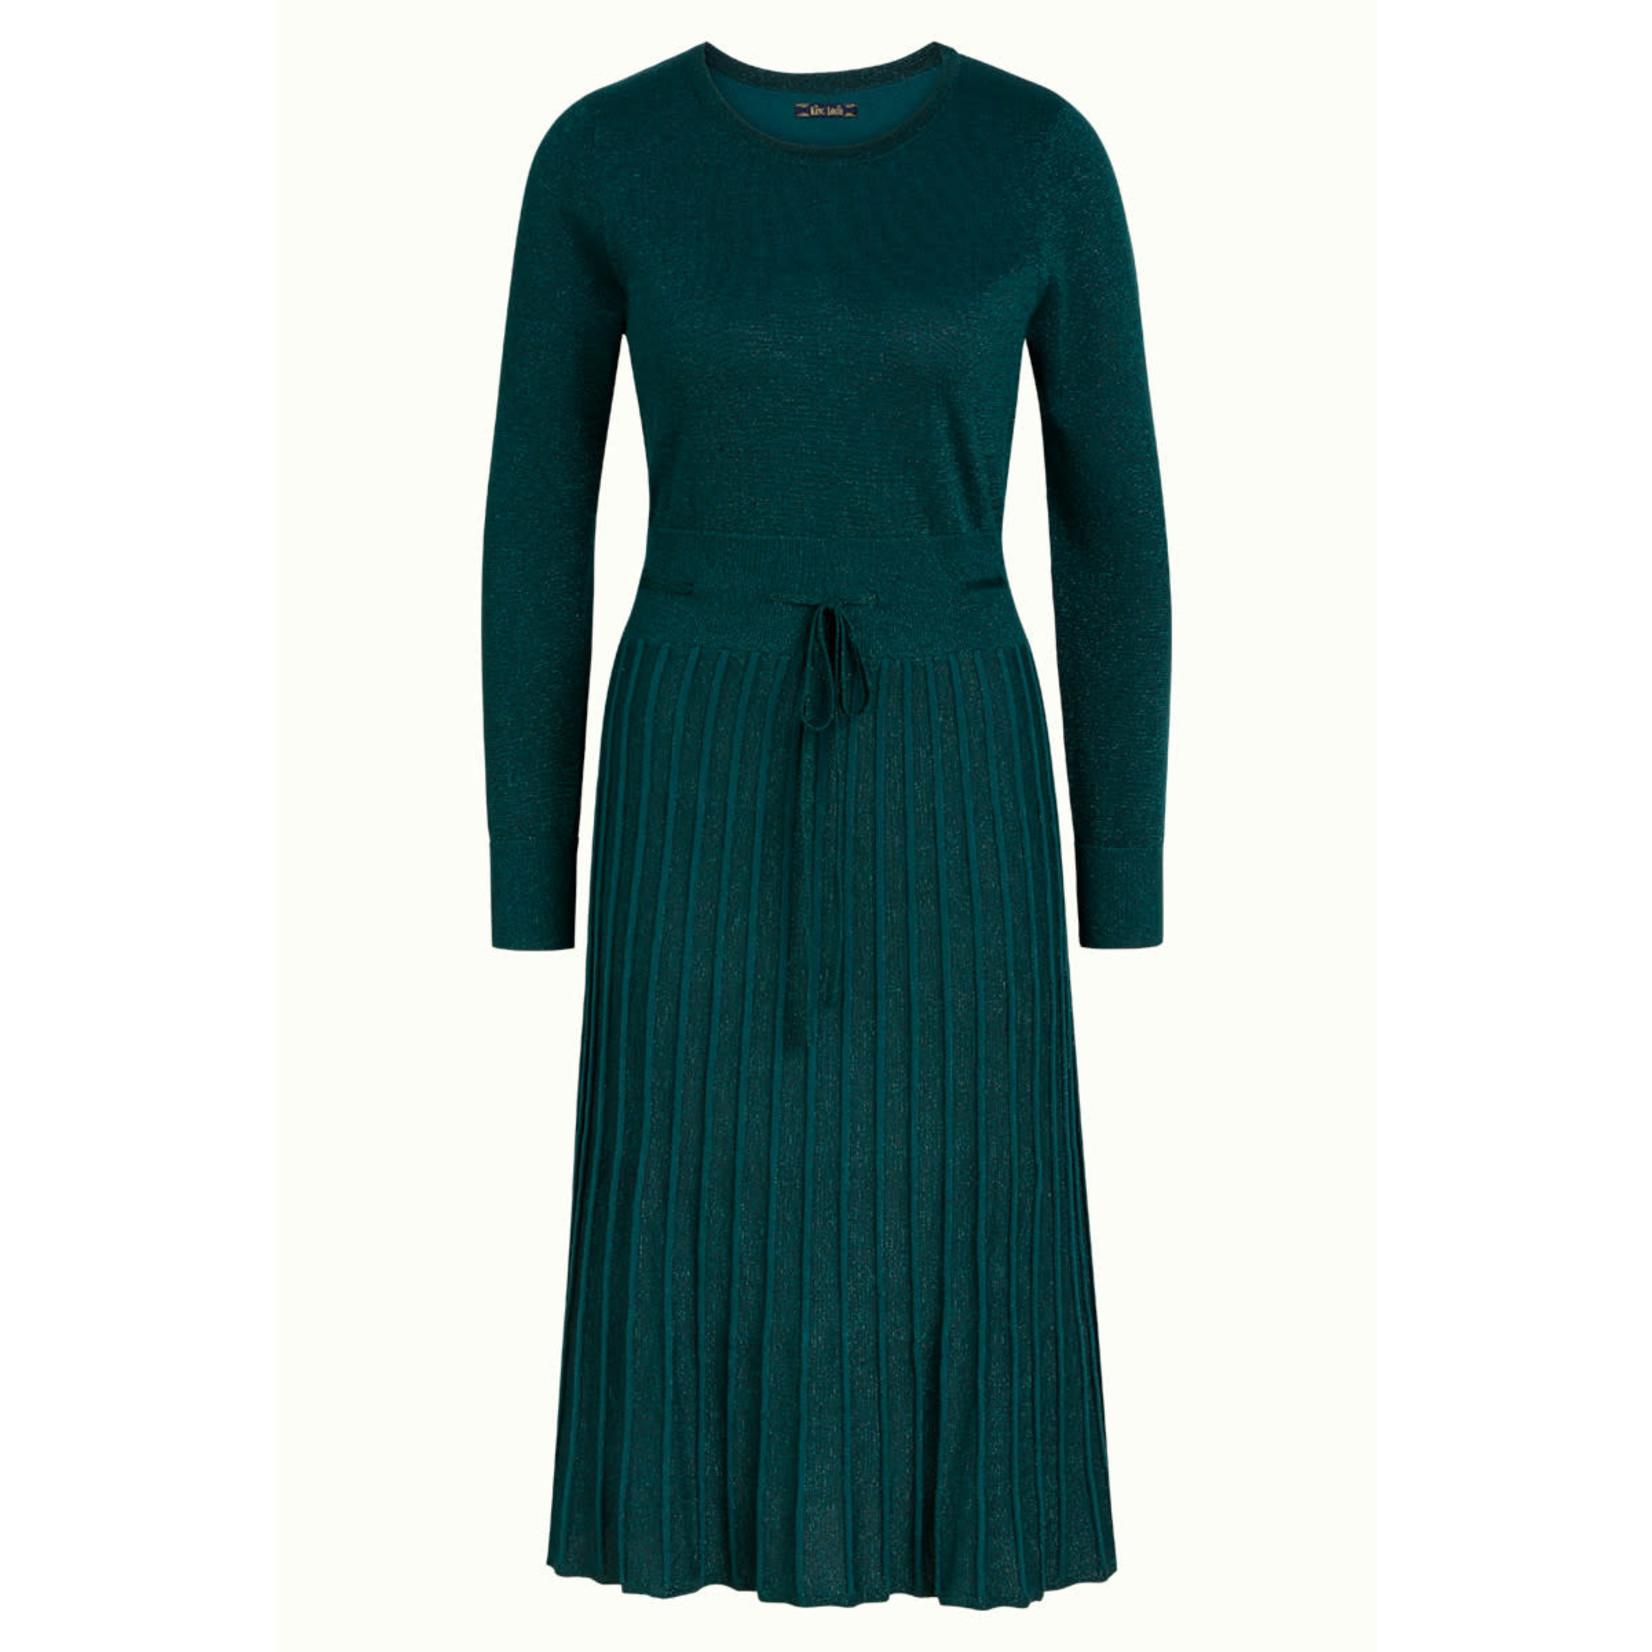 King Louie King Louie Plissé Knit Dress Azul 06413